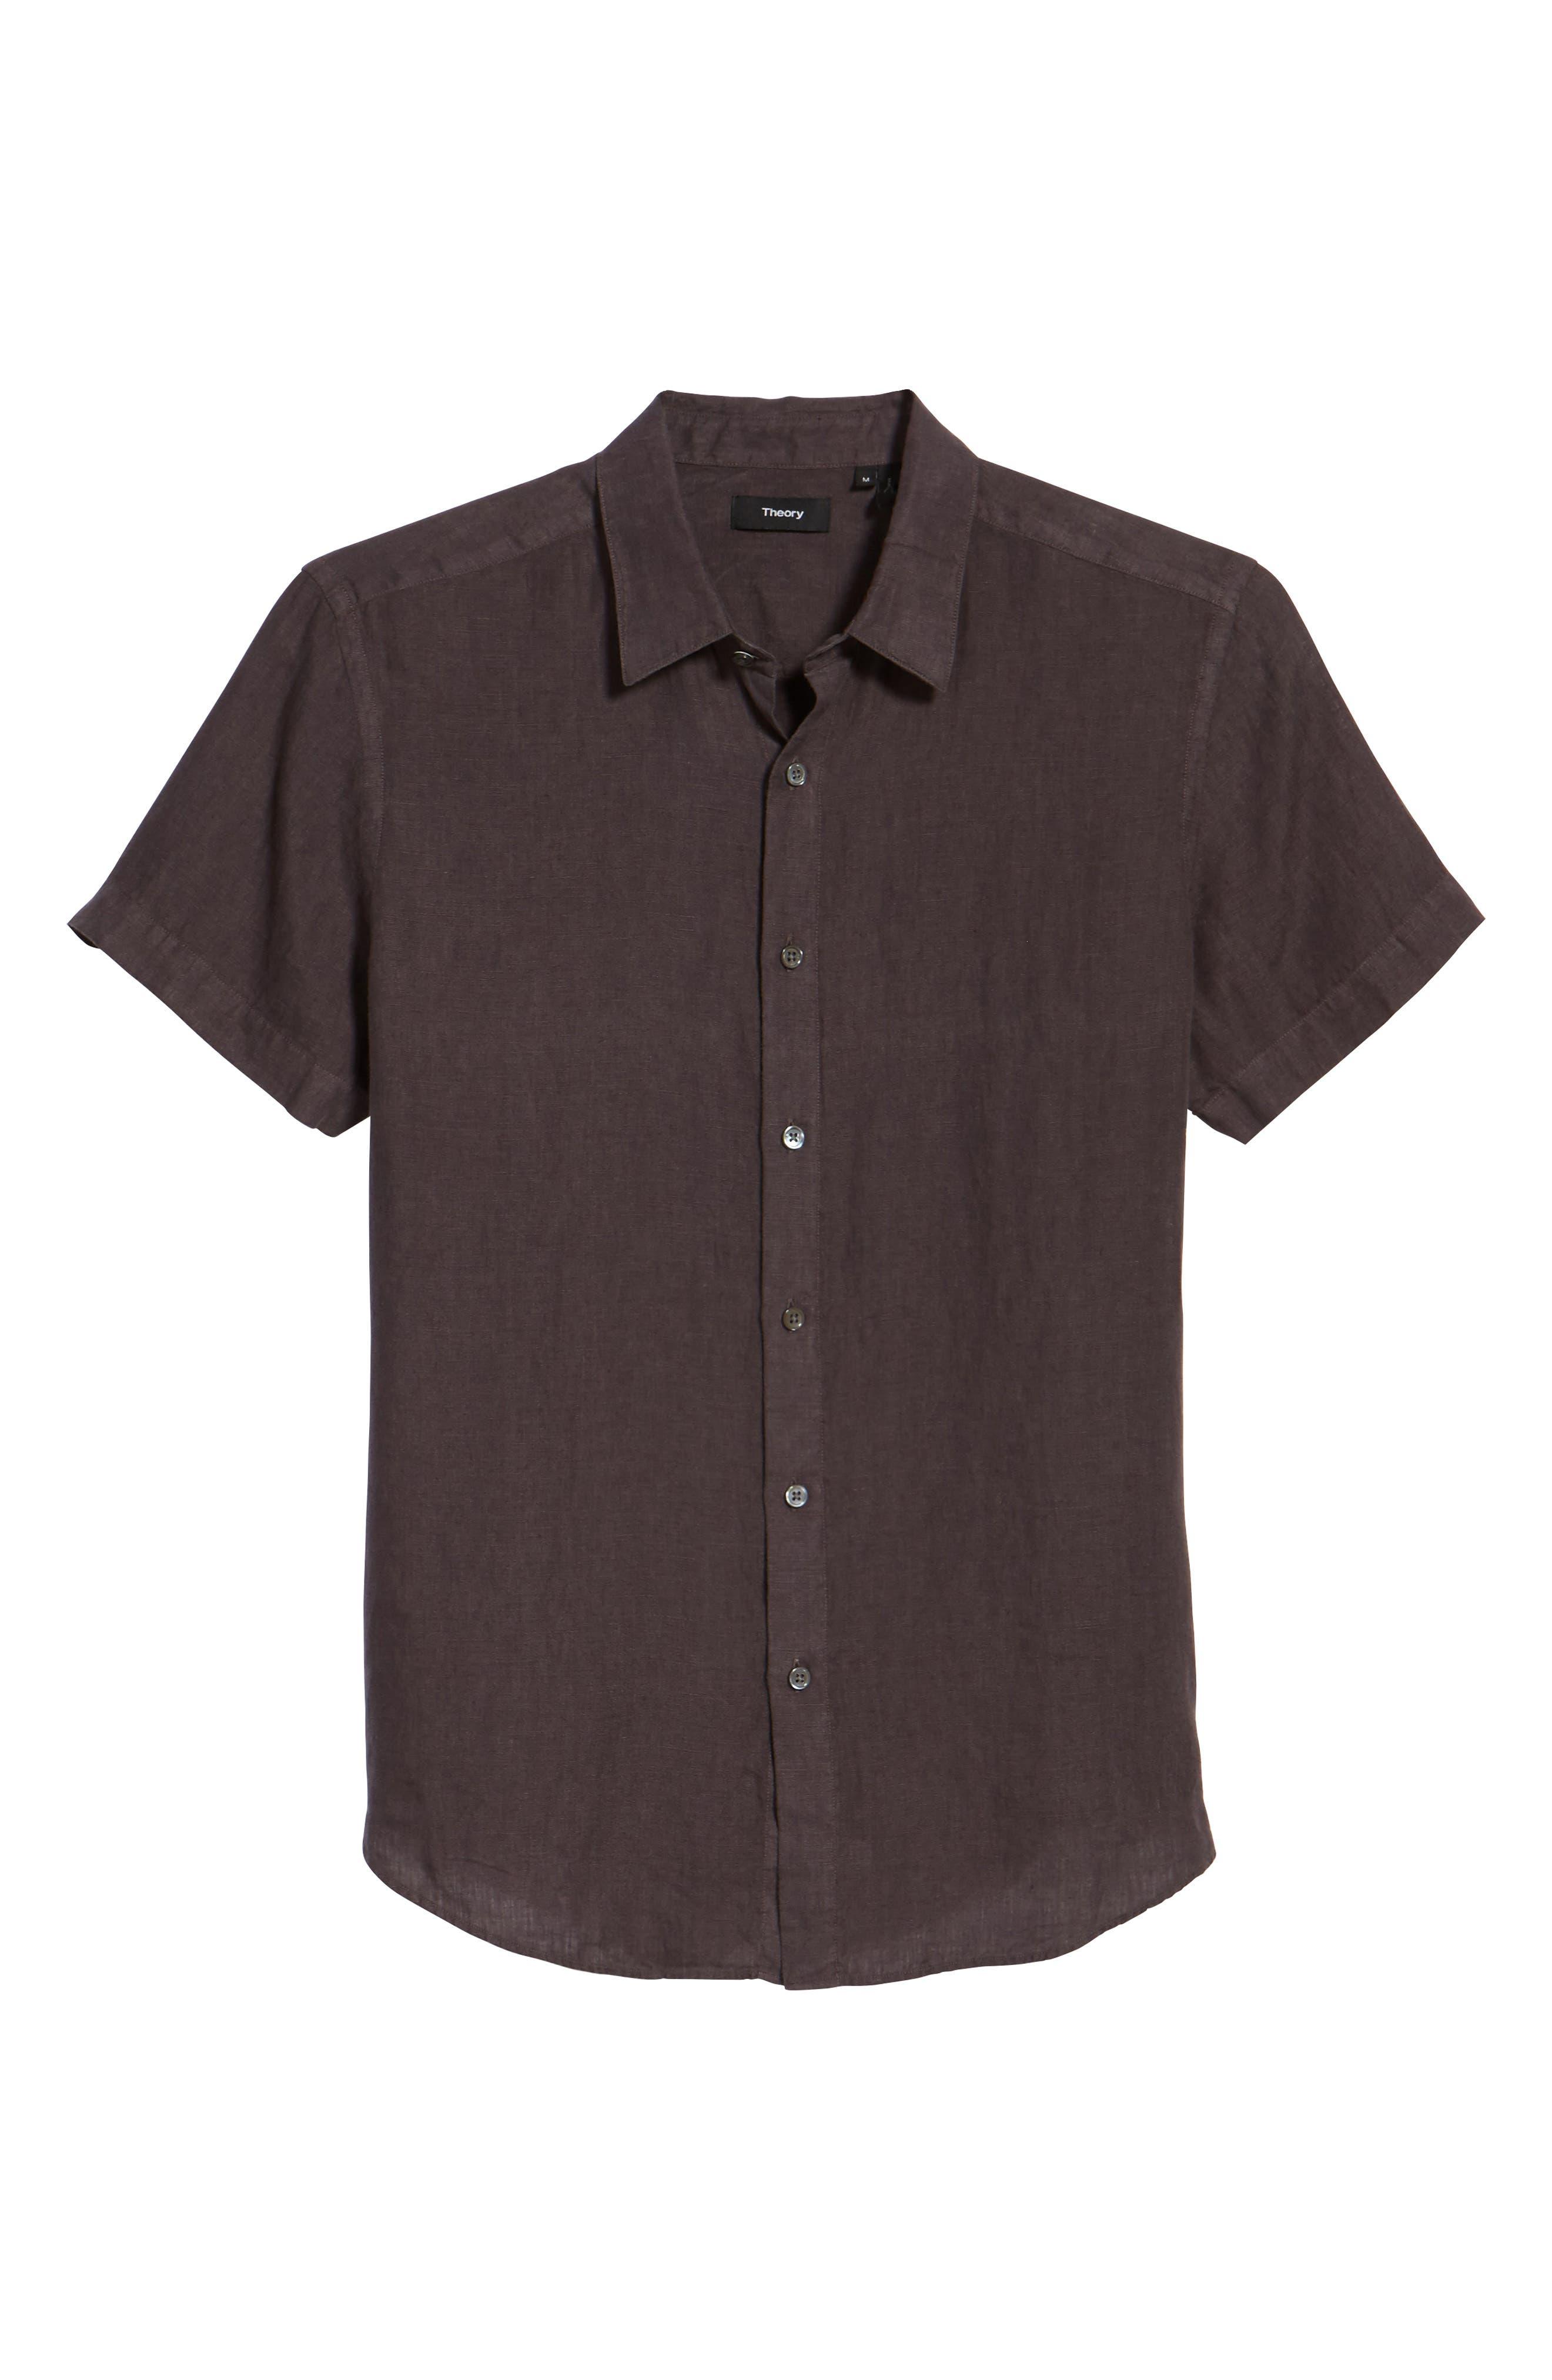 Alternate Image 1 Selected - Theory Clark Trim Fit Linen Sport Shirt